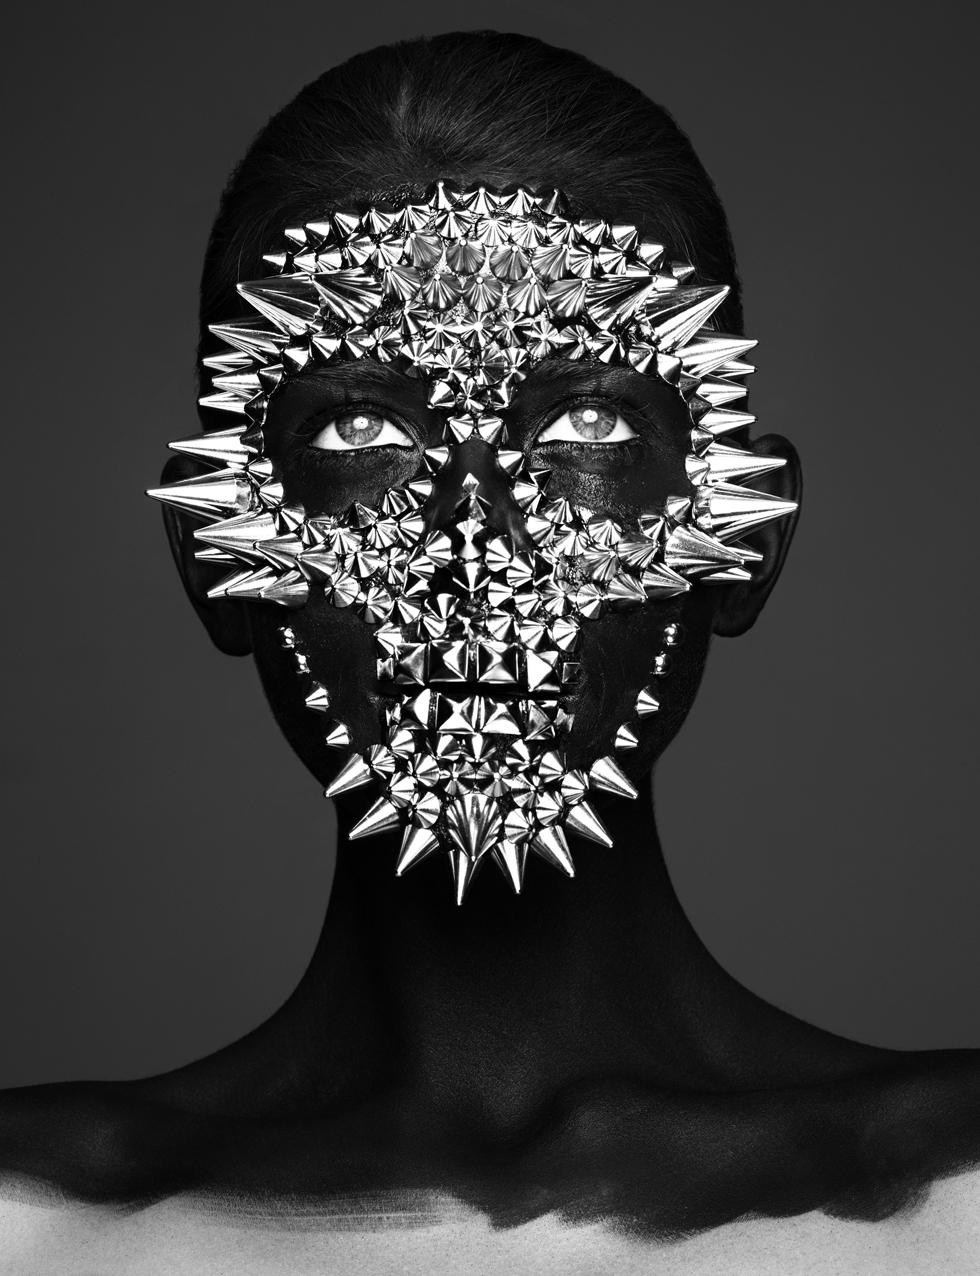 andrew-gallimore-diadelasmuertes-masks-07